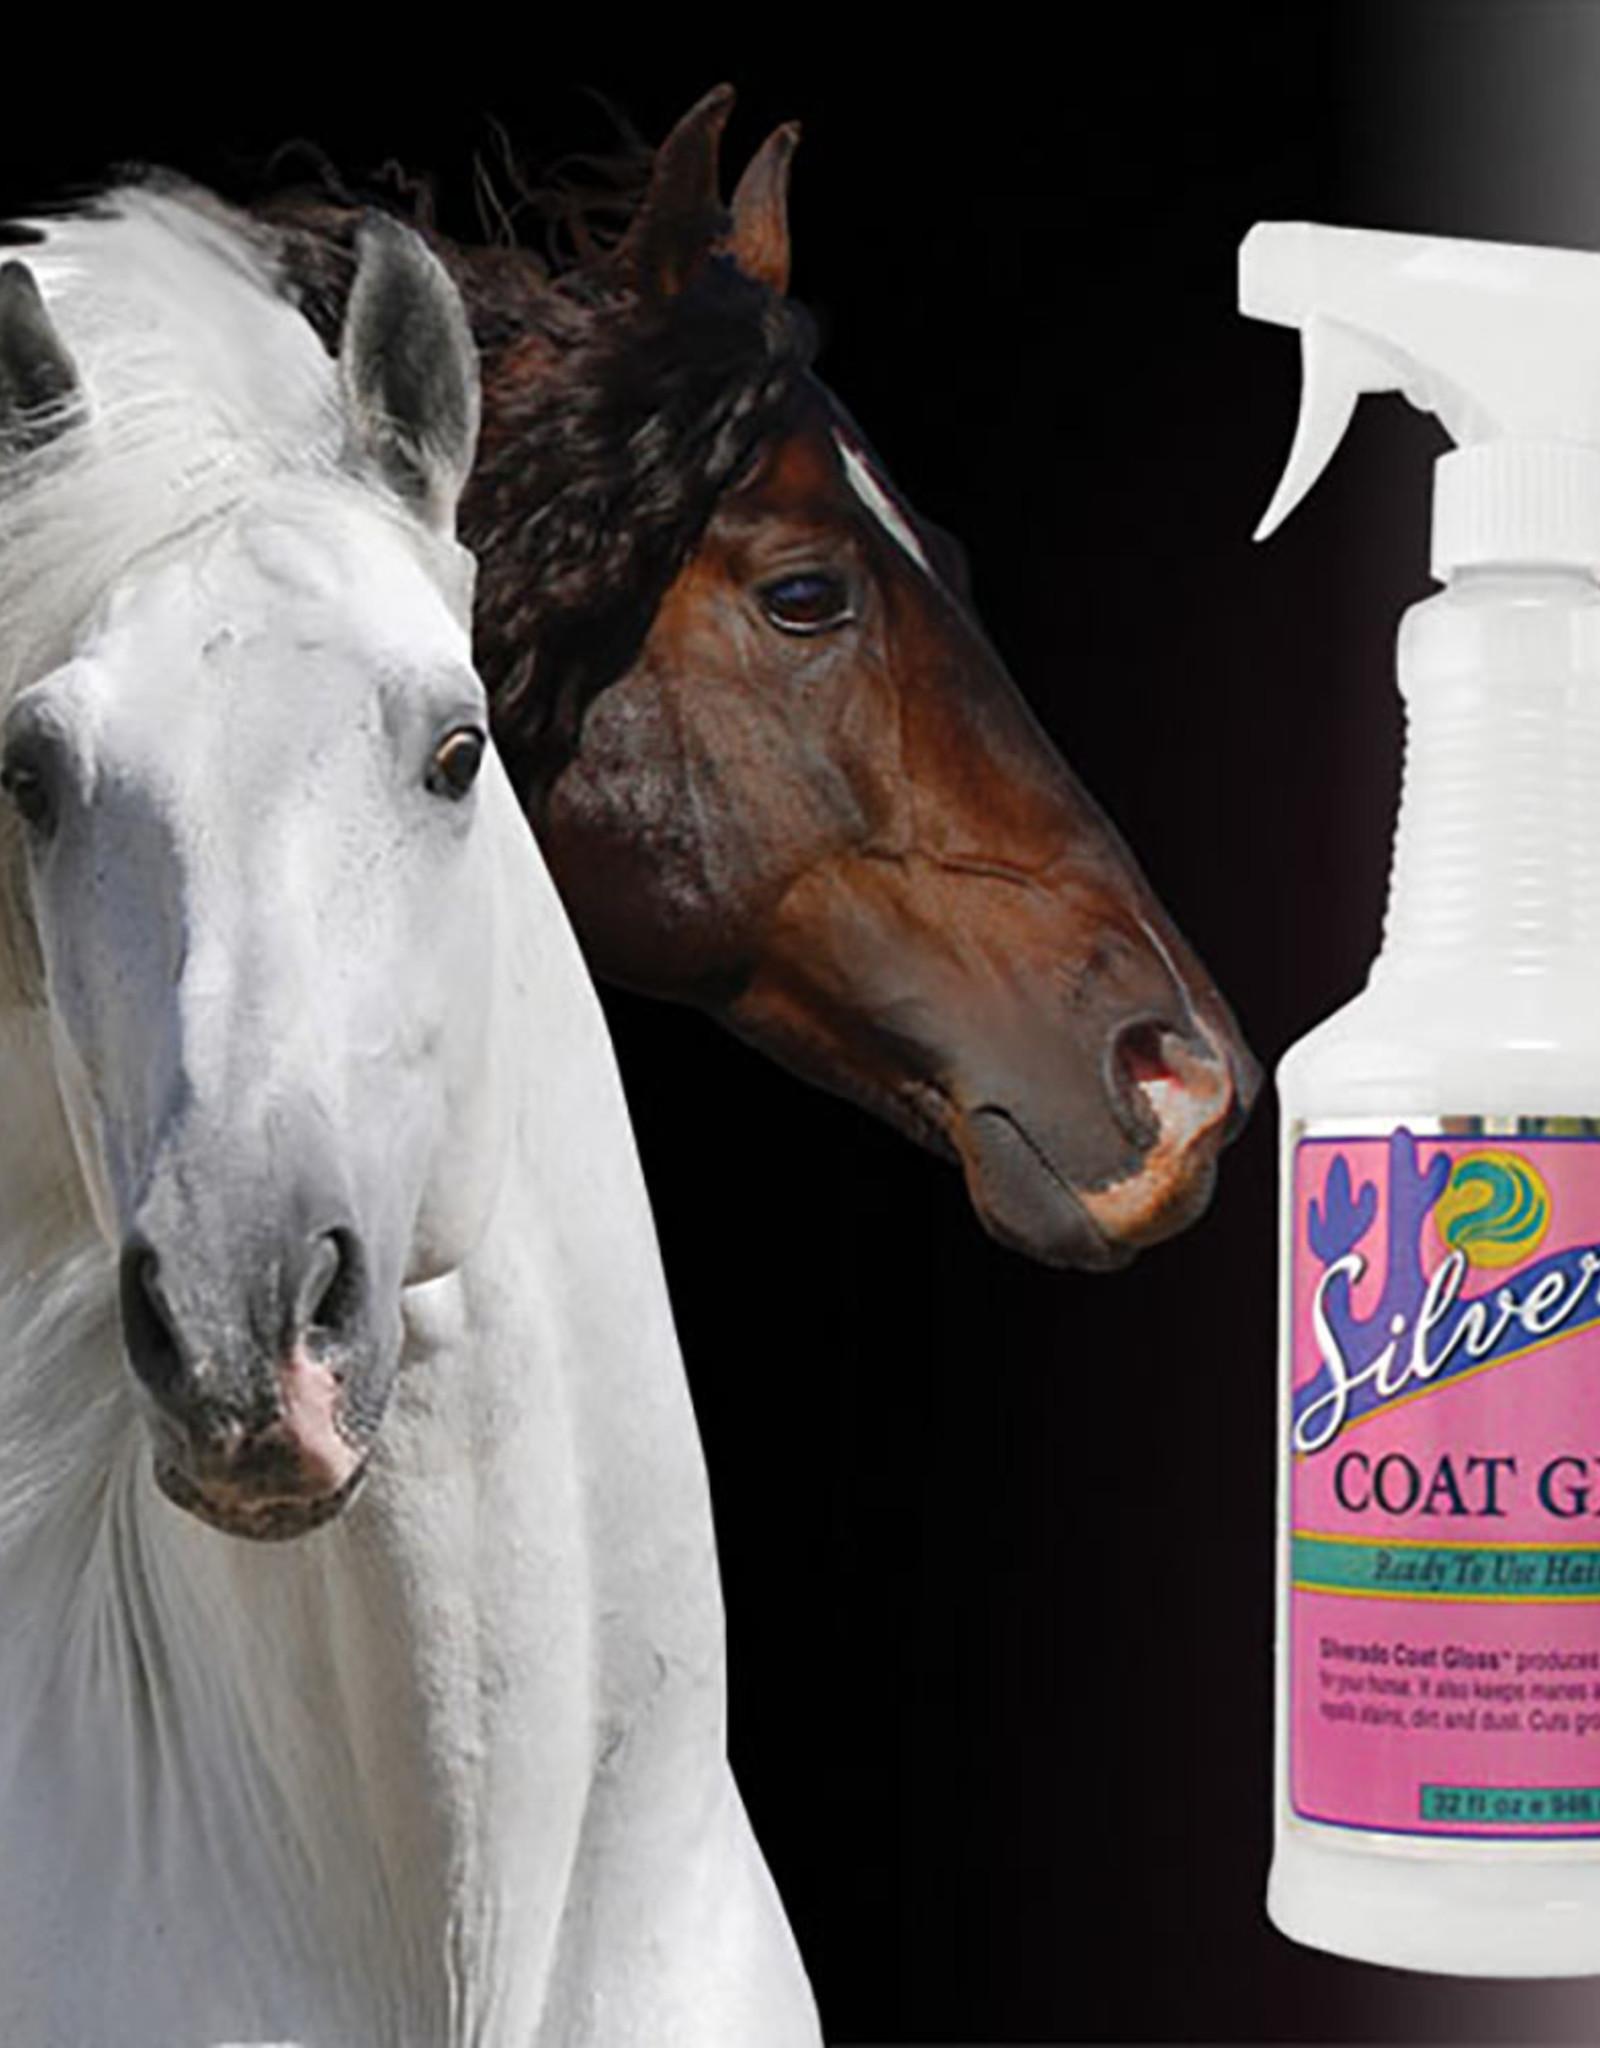 HEALTHY HAIR CARE SILVERADO COAT GLOSS 32 OZ